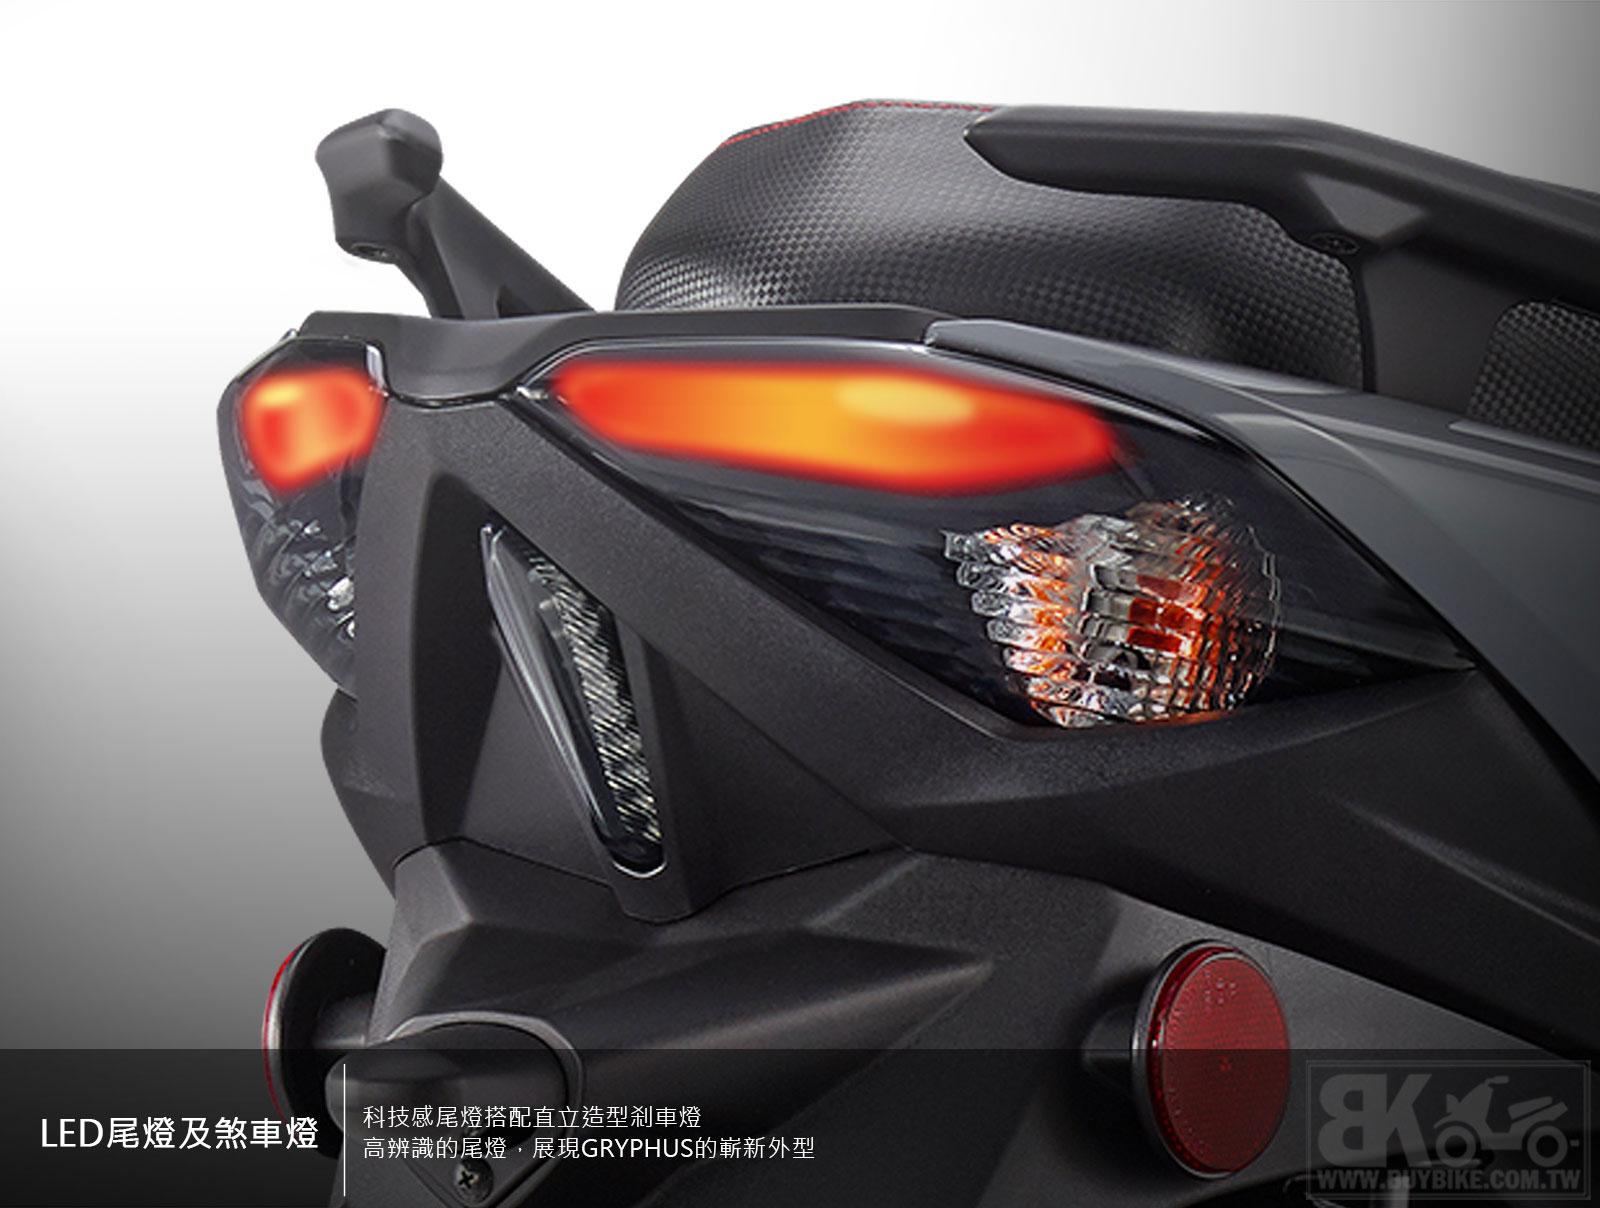 03.LED尾燈及煞車燈